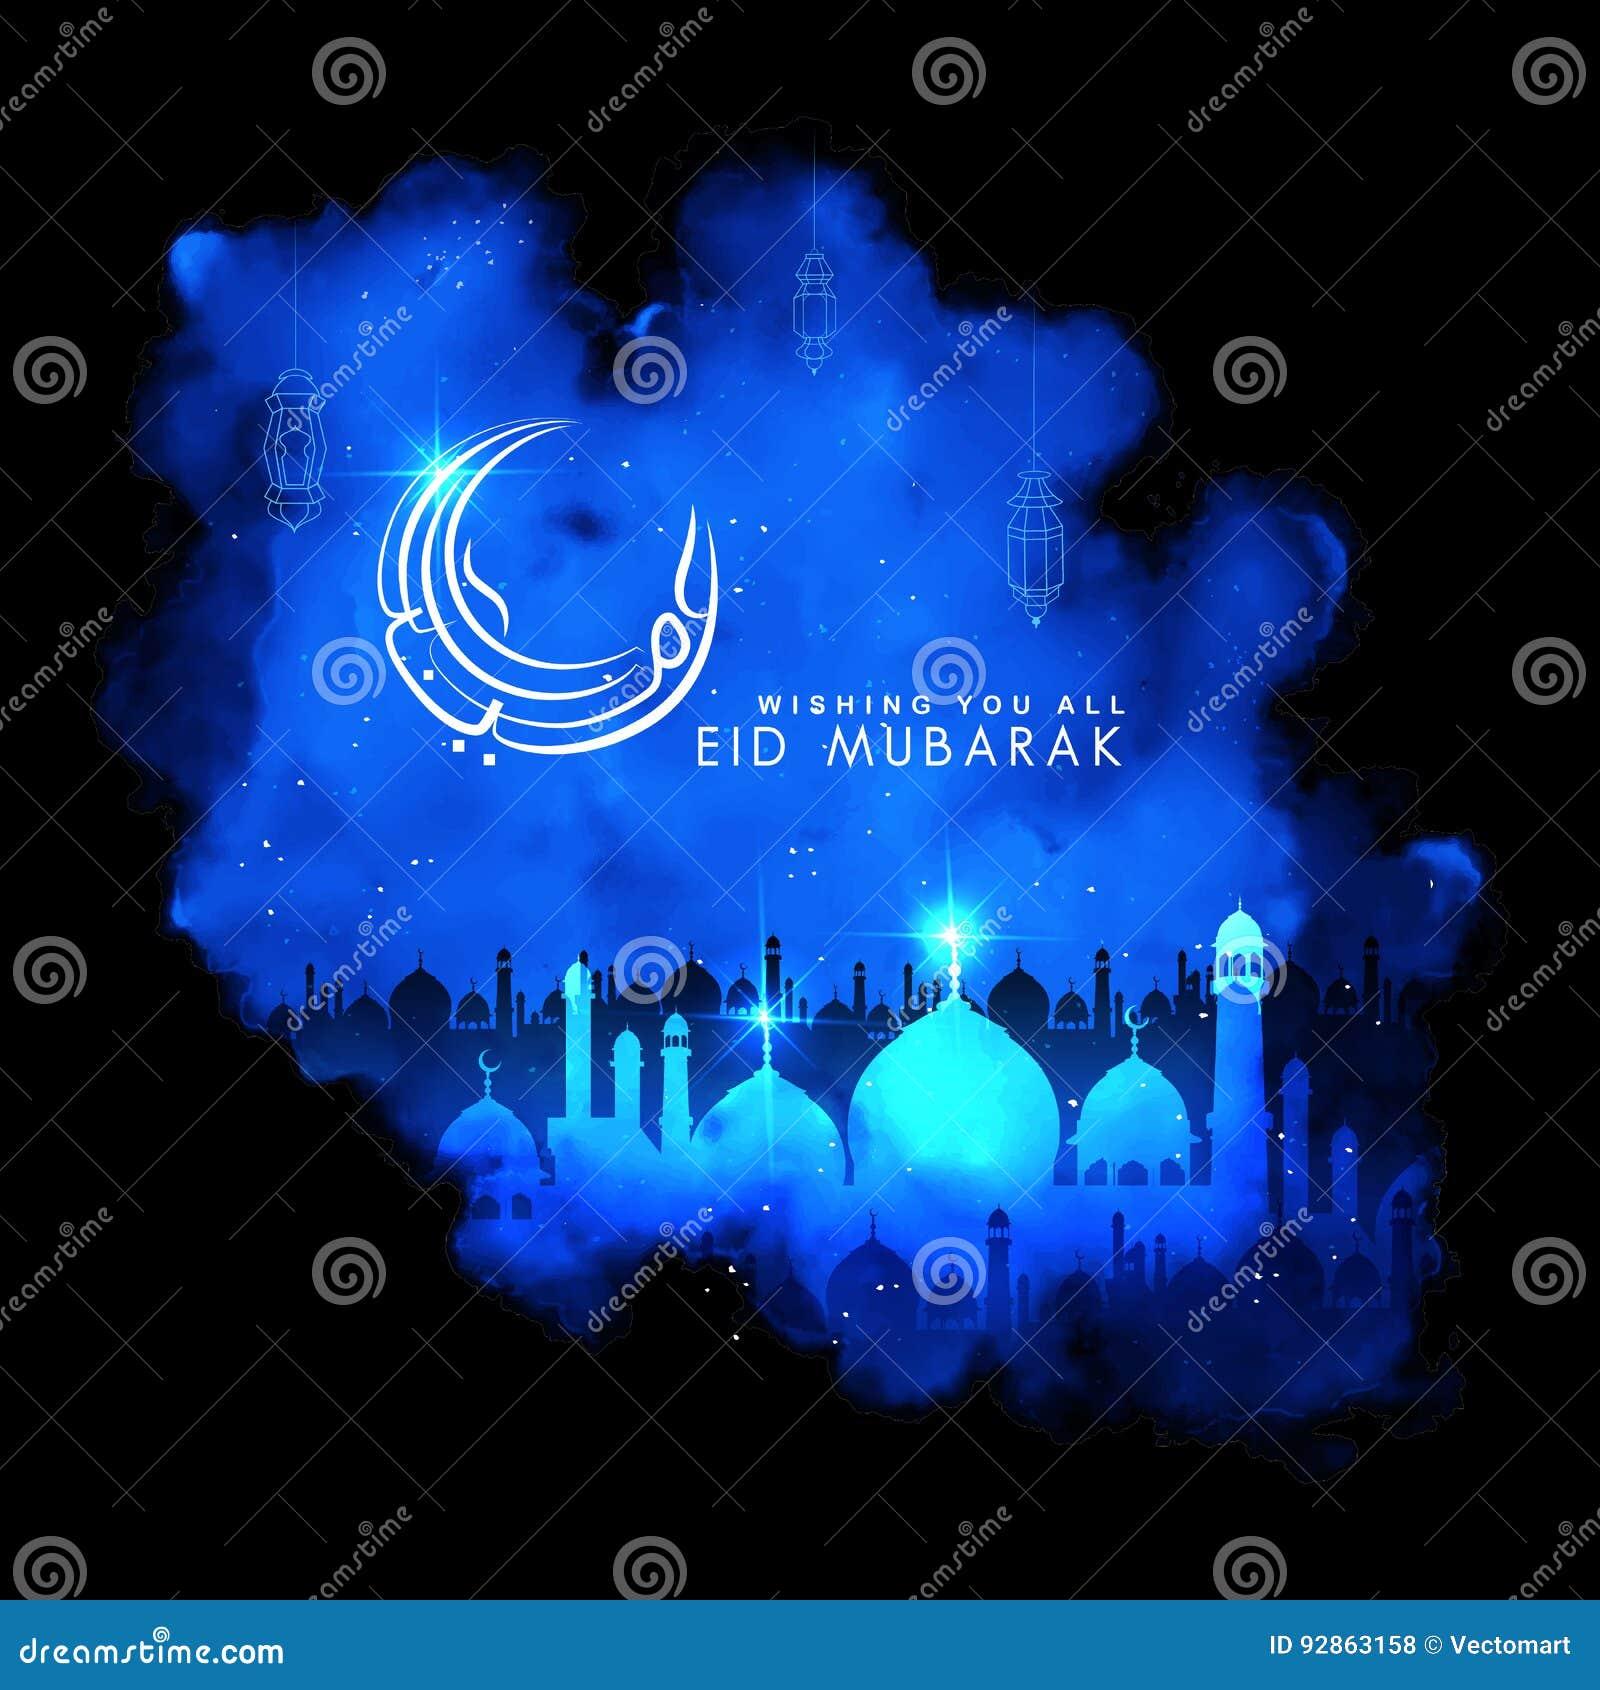 Eid Mubarak Happy Eid Greetings In Arabic Freehand With Mosque Stock